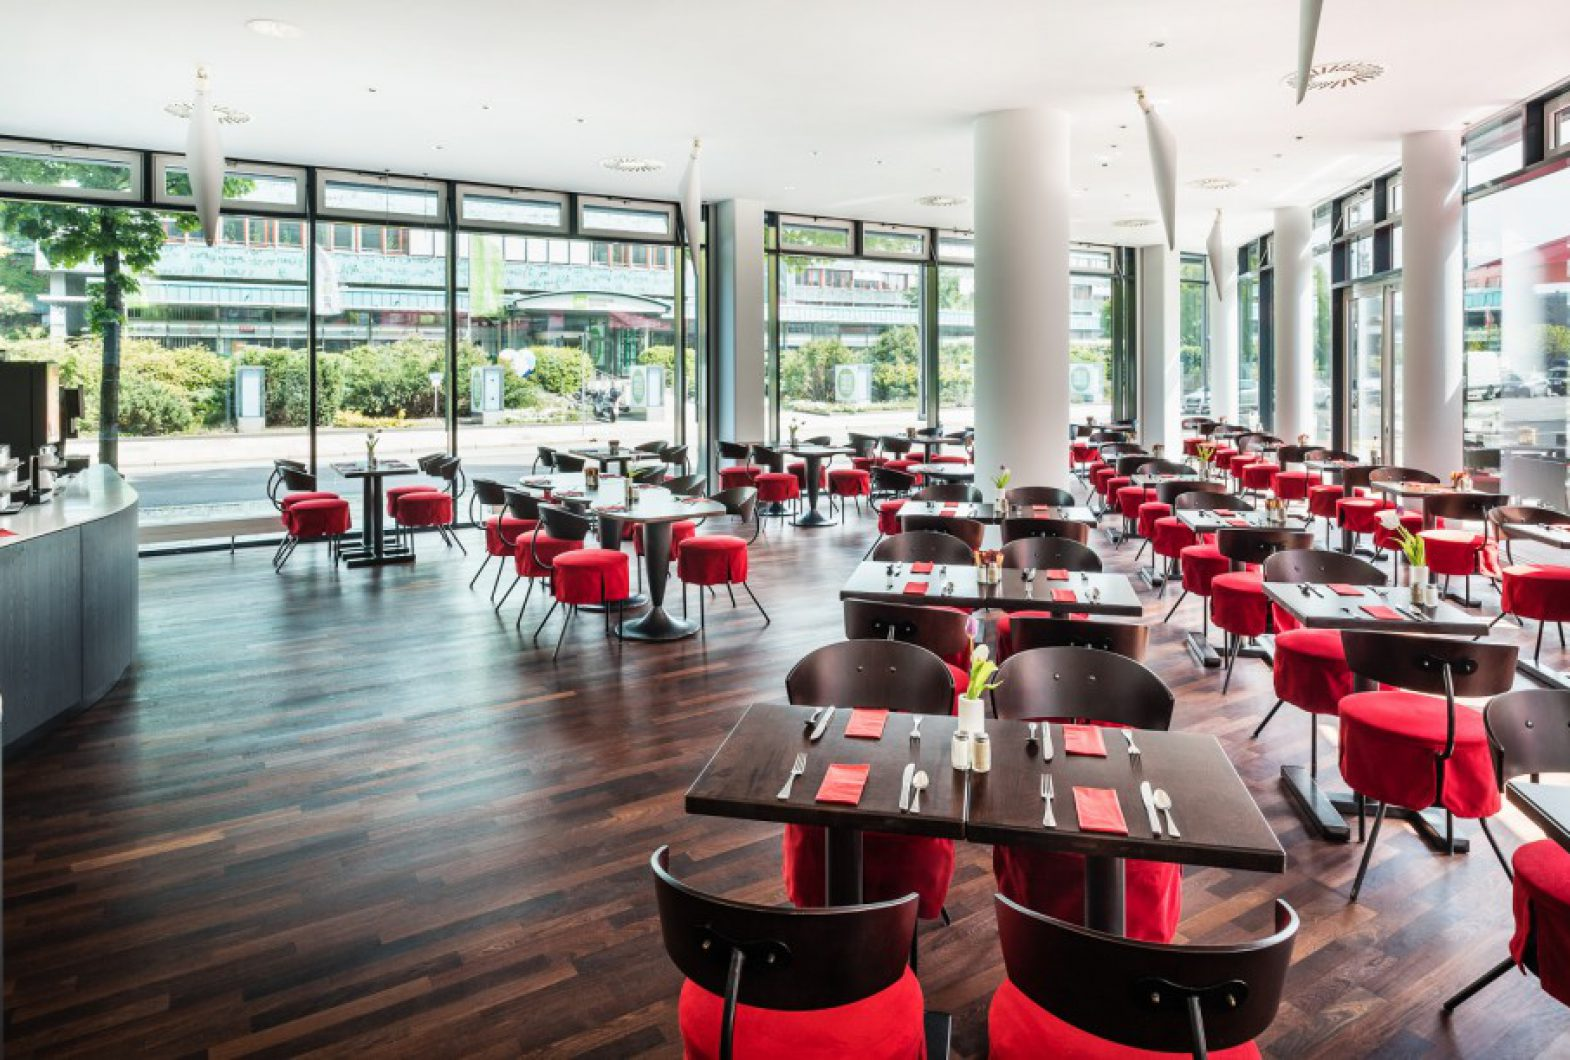 Penck Restaurant